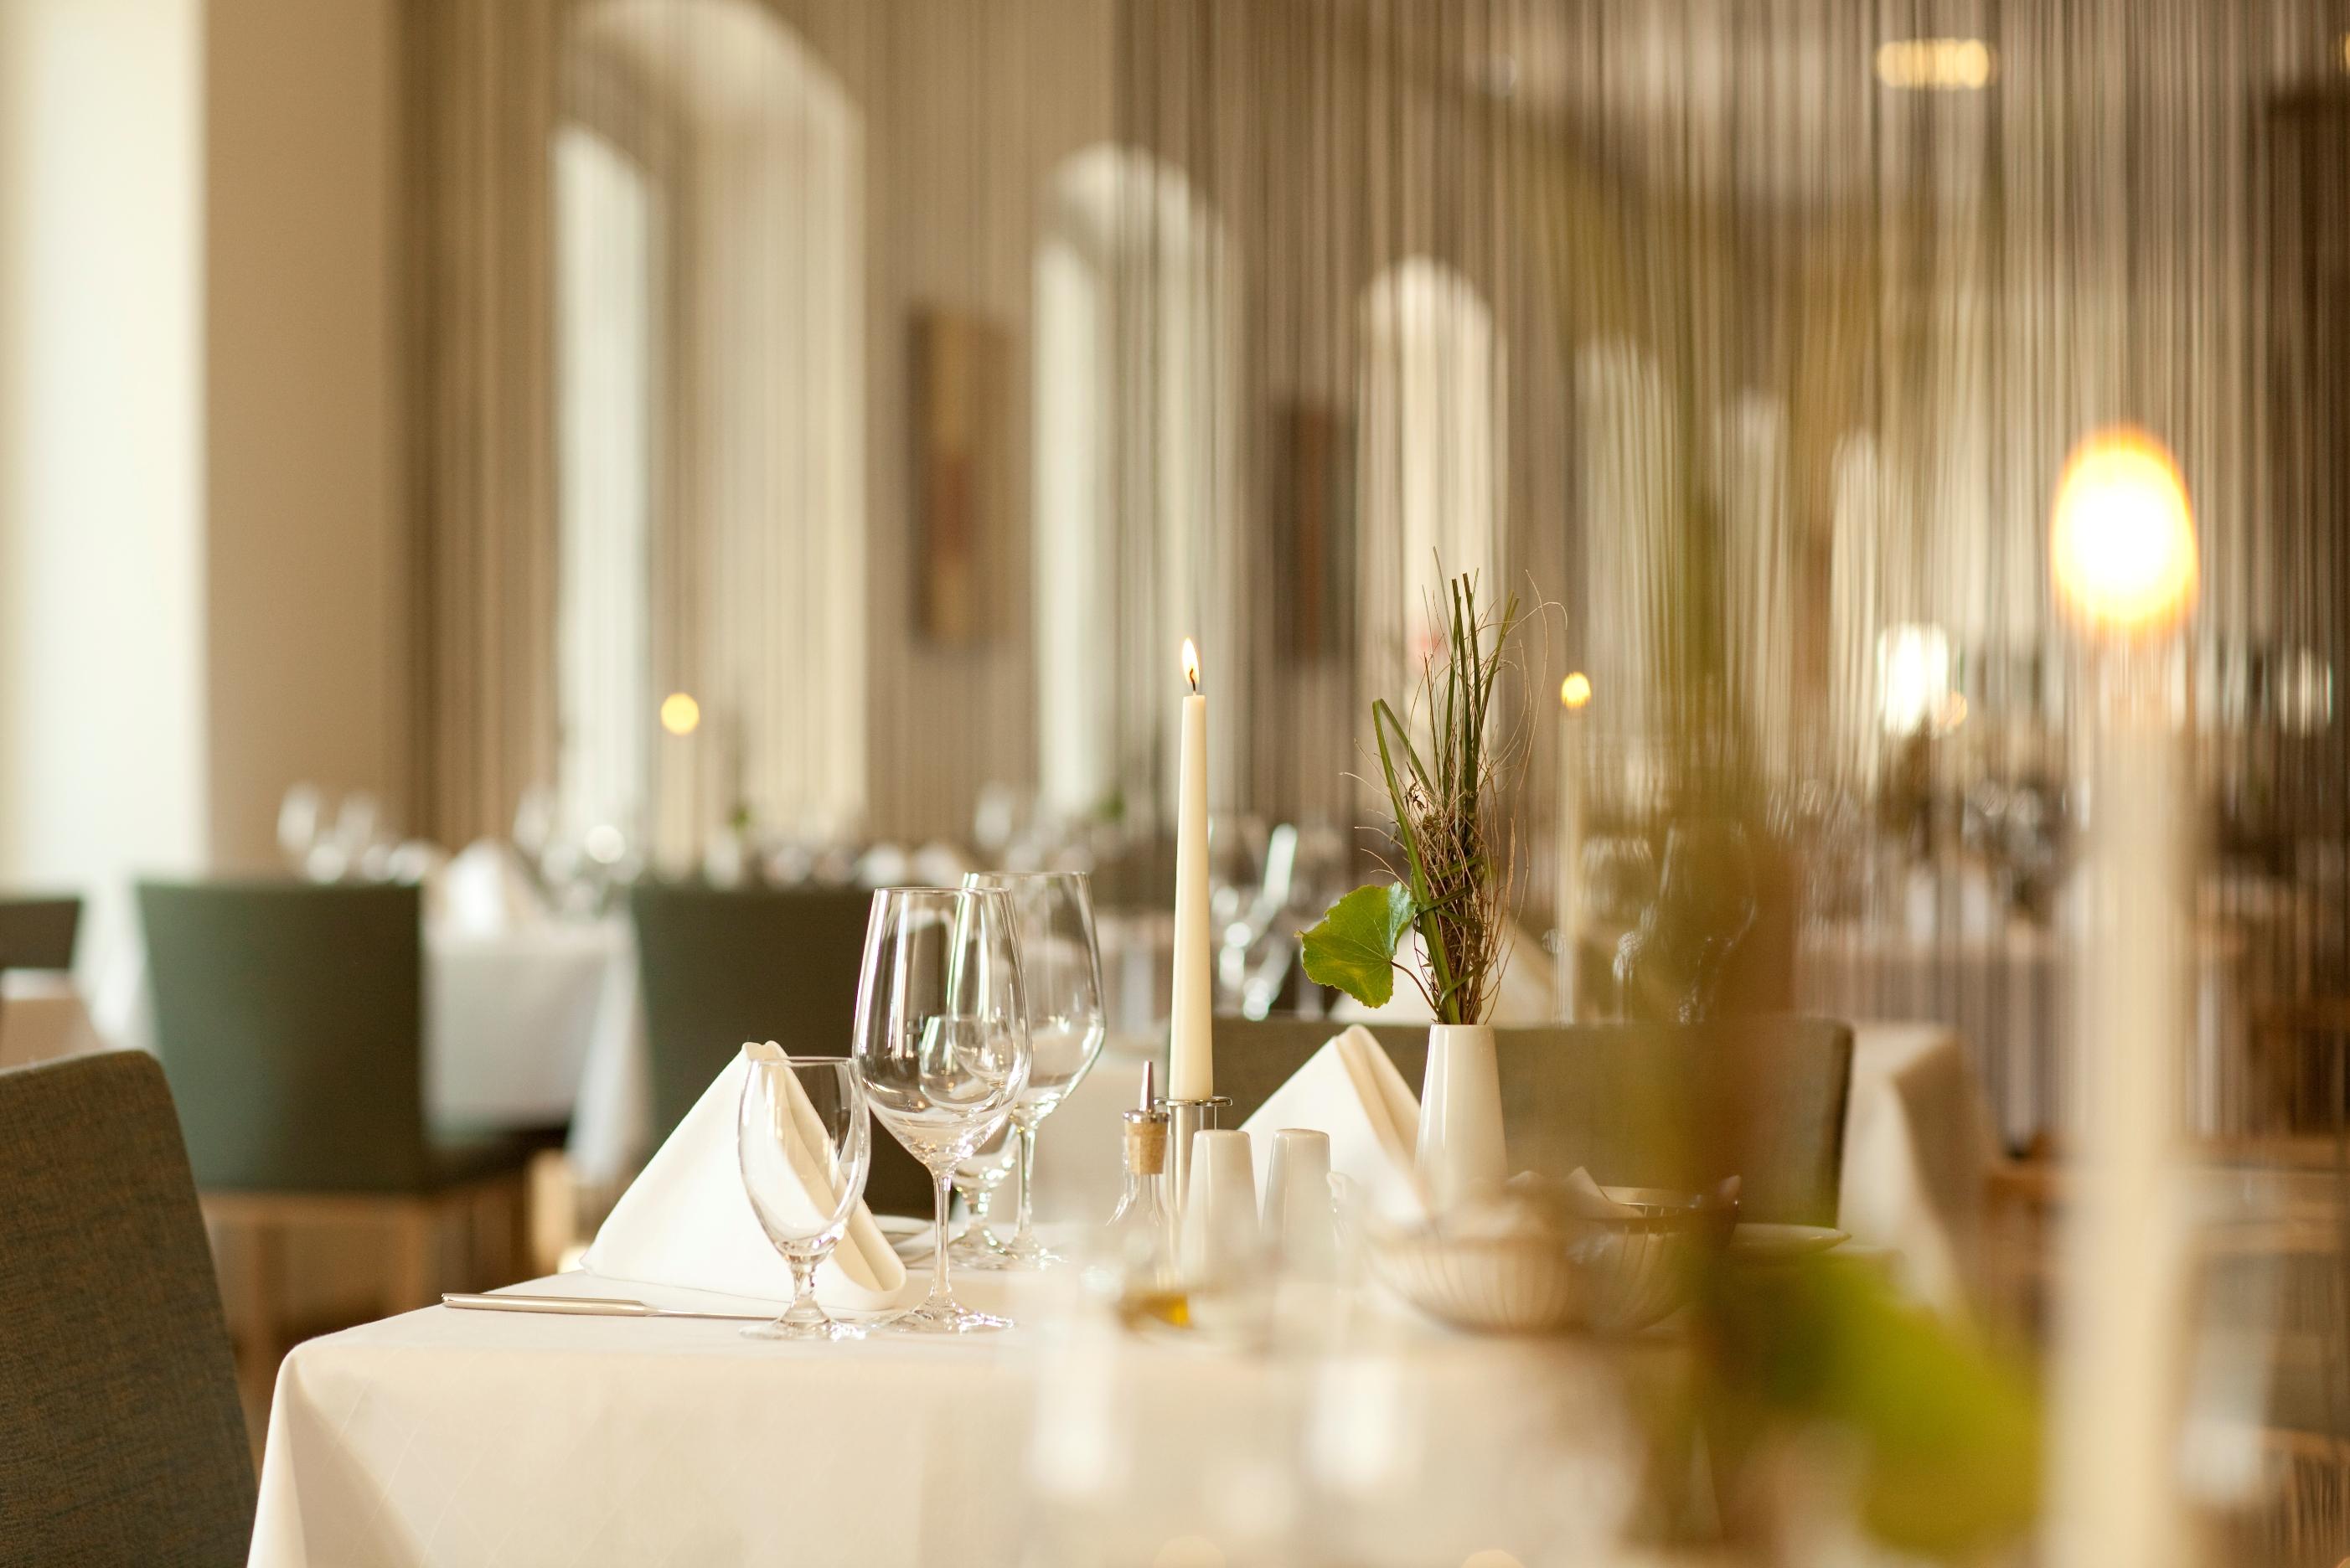 RestaurantWellenstein - Kopie.jpg